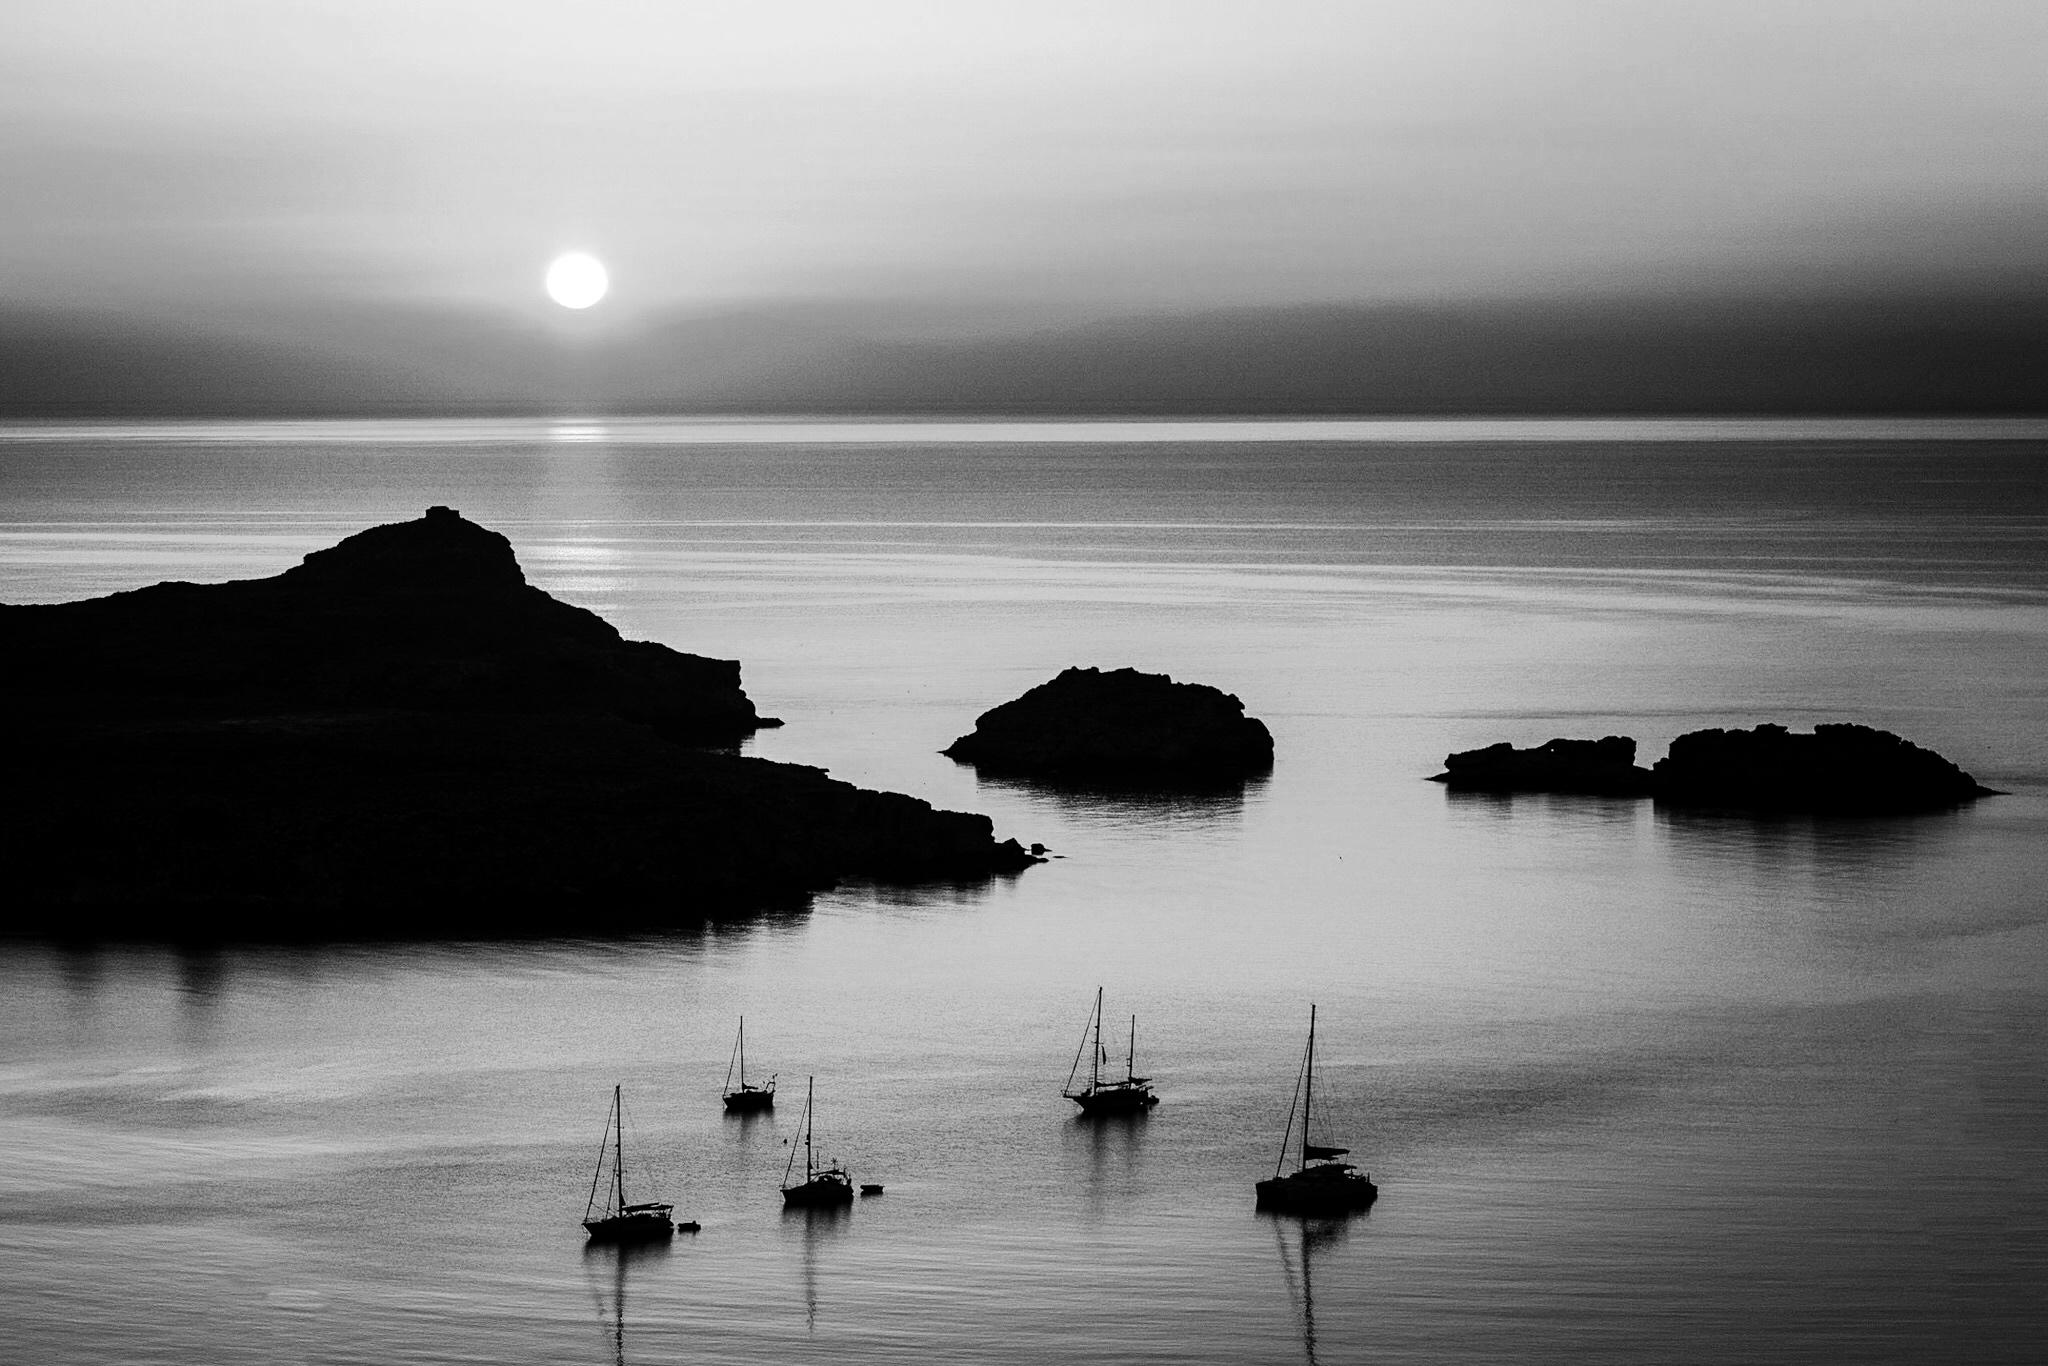 Sunrise at Lindos by travel photographer Rick McEvoy